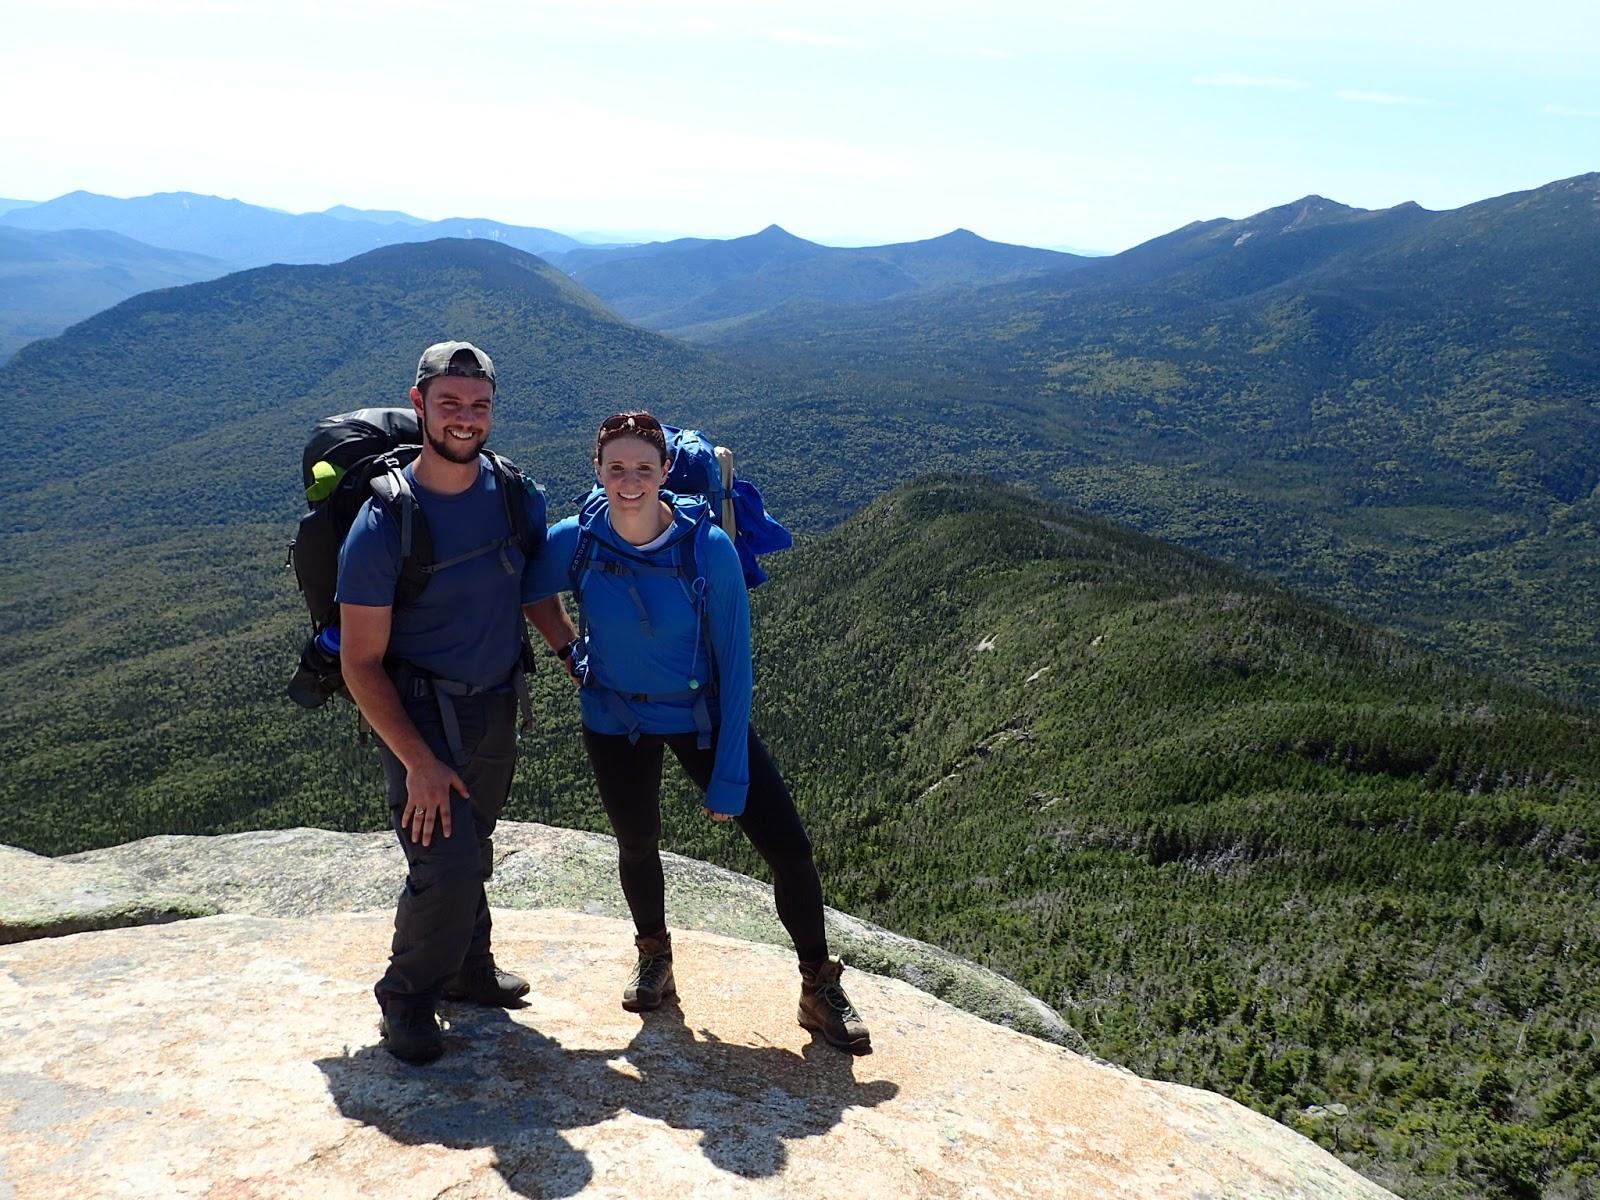 Trip Report: Backpacking New Hampshire's Pemigewasset Loop